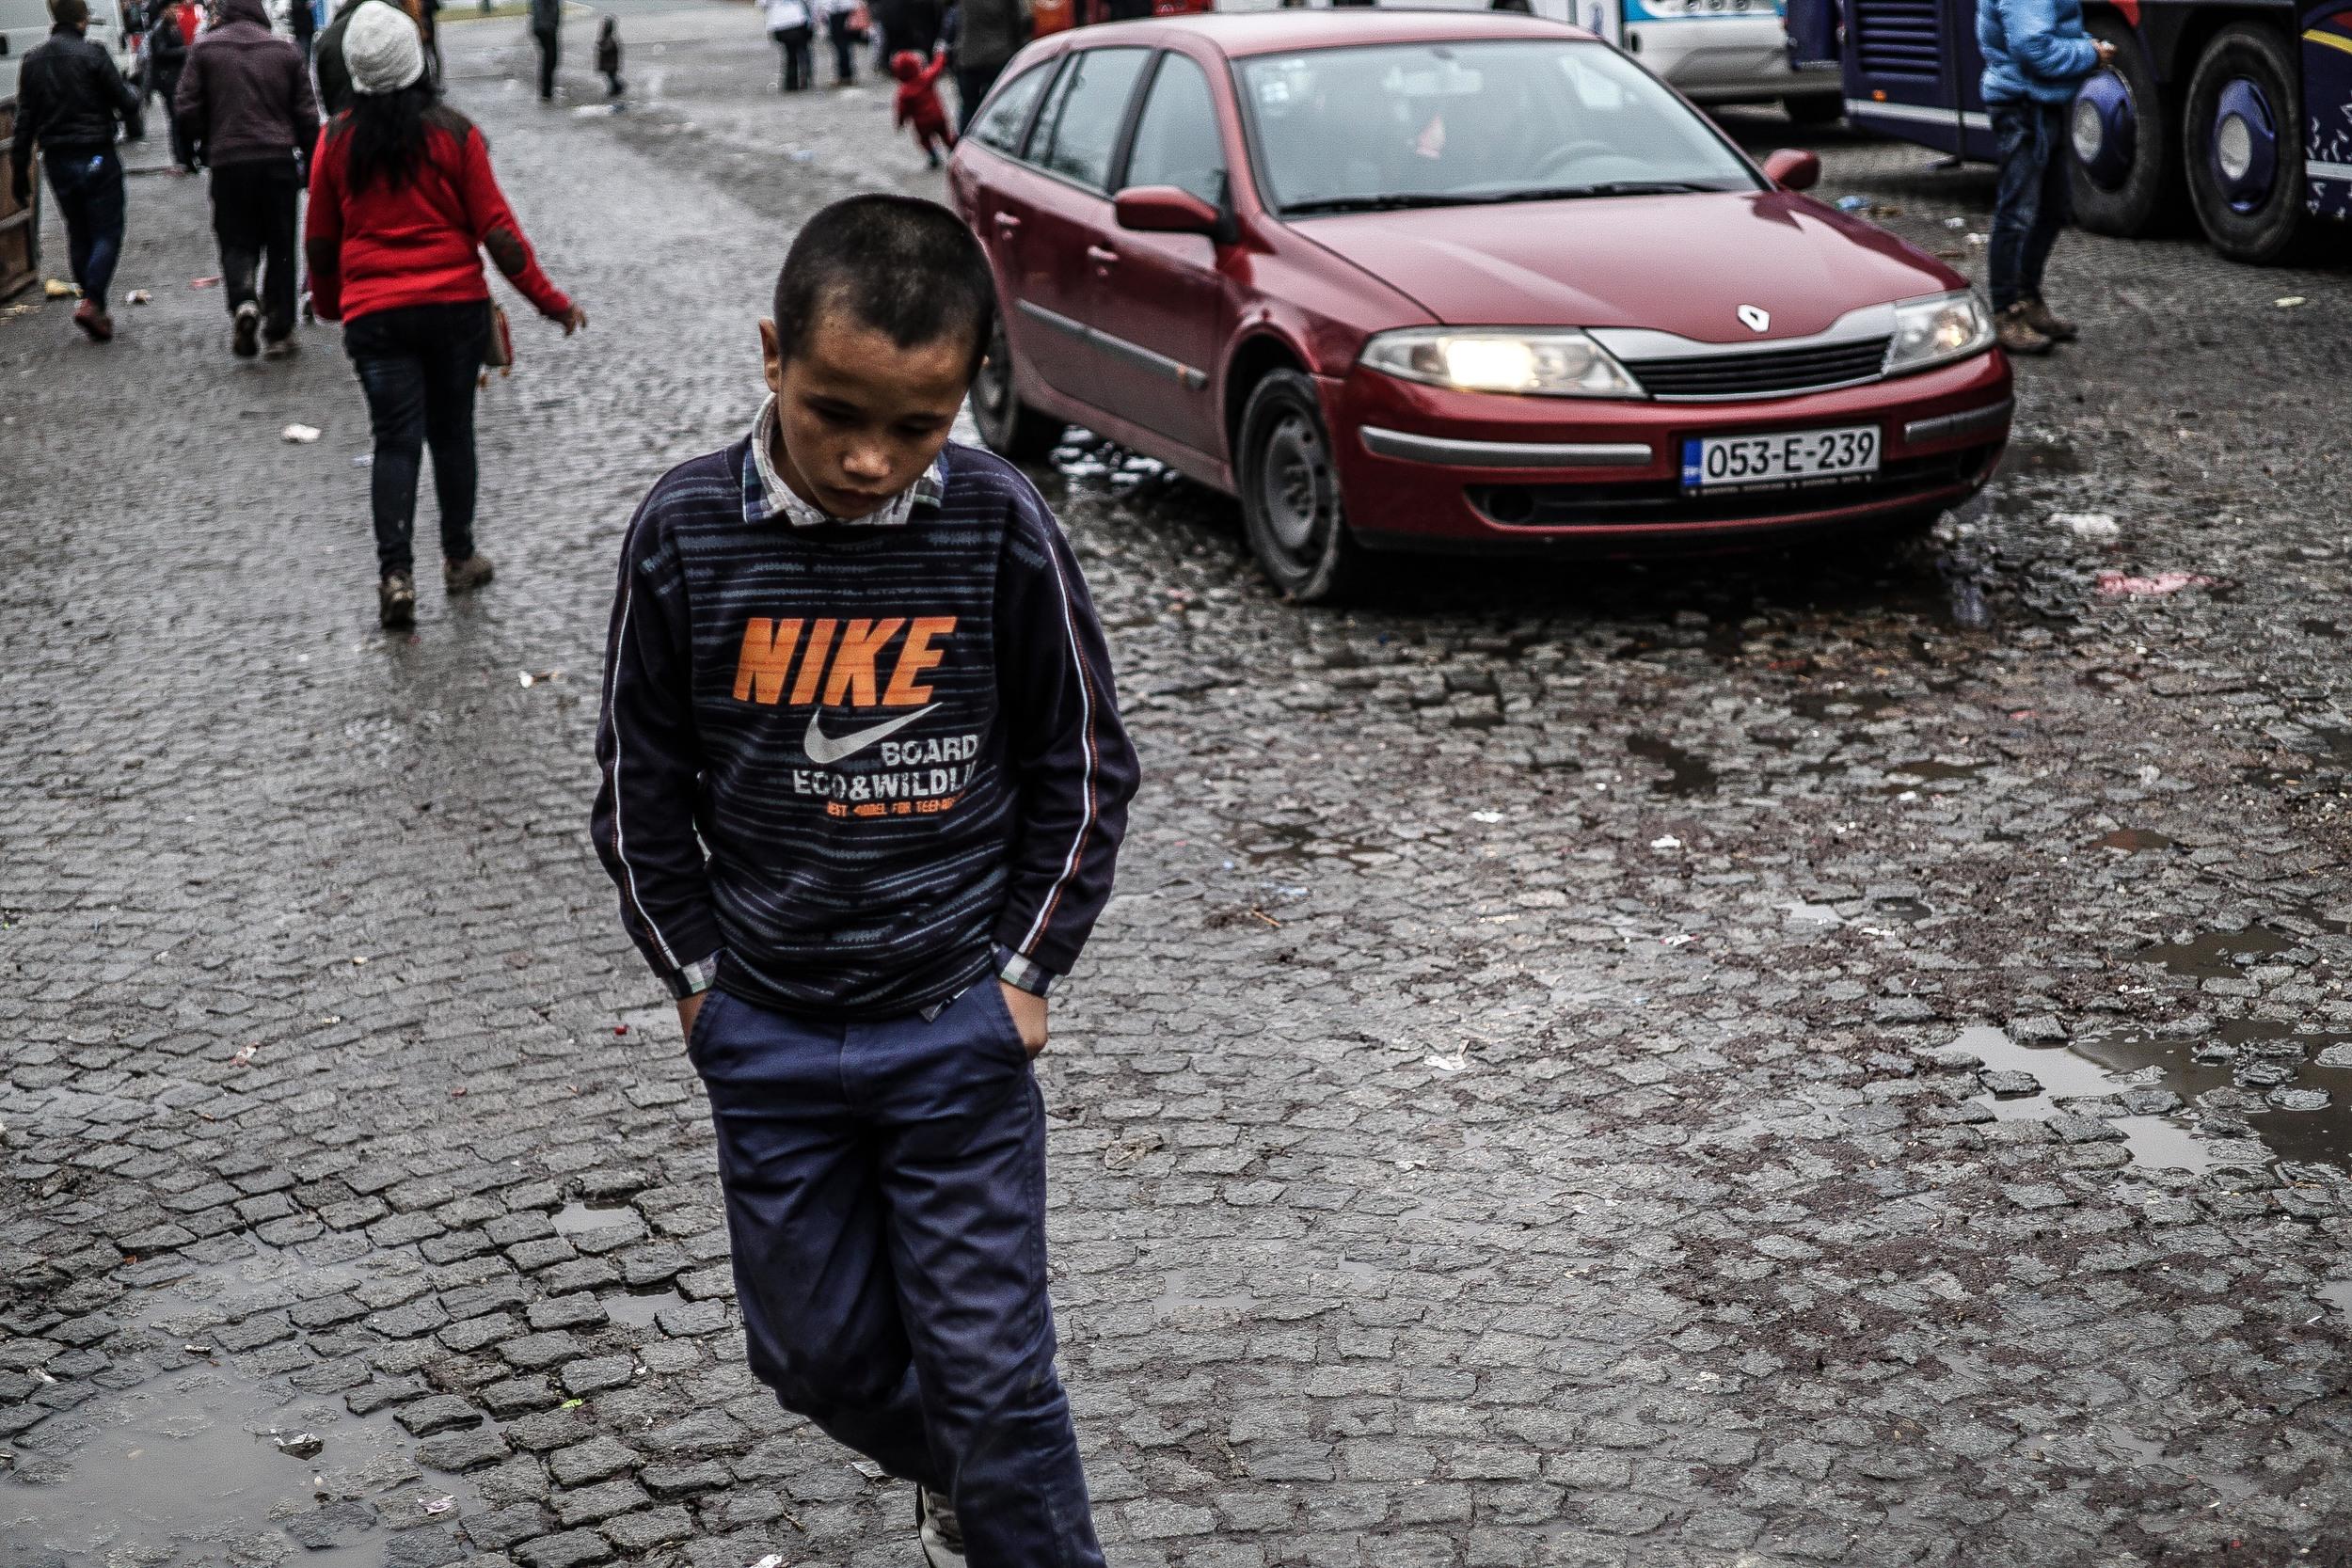 Syrian Refugee Crisis Serbia November 2015 8.jpg